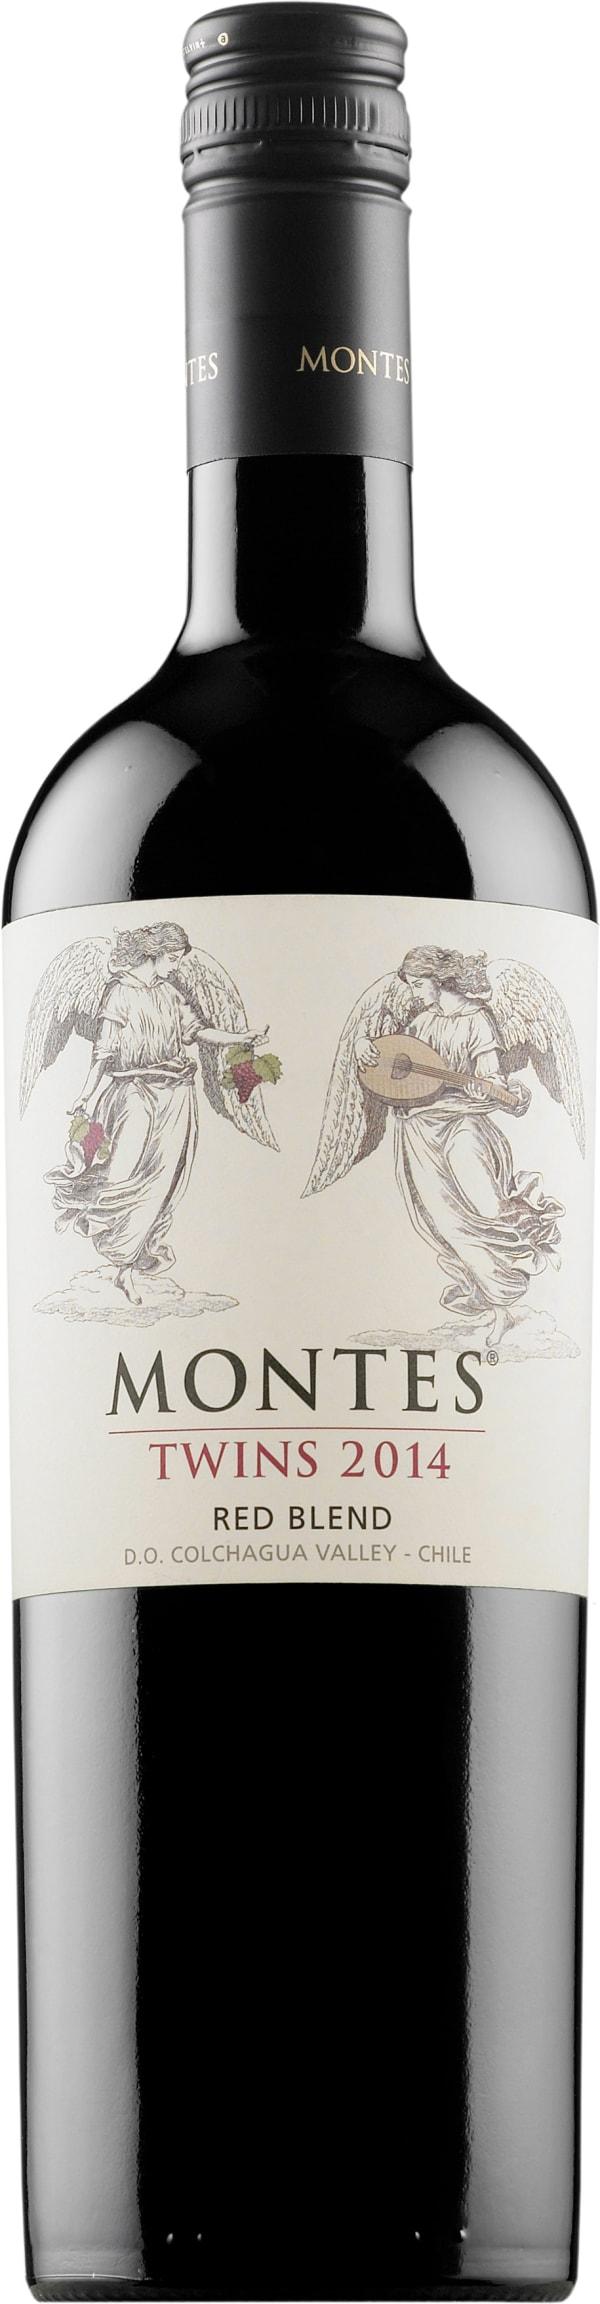 Montes Twins 2016